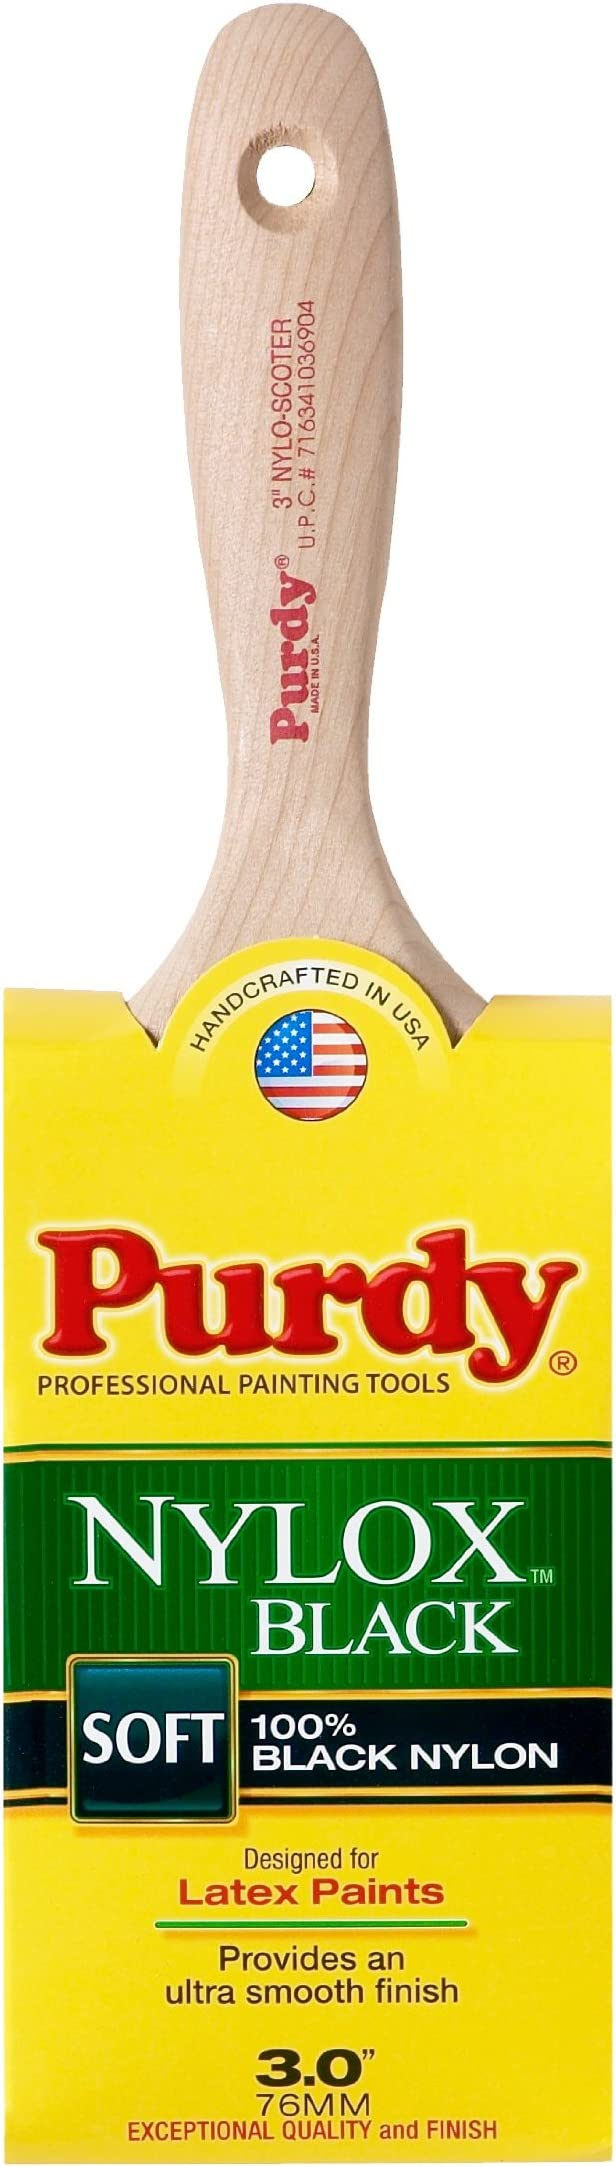 "Purdy Corporation 140152335 3.5/"" Black Nylon Glide Angle Paint Brush Large"